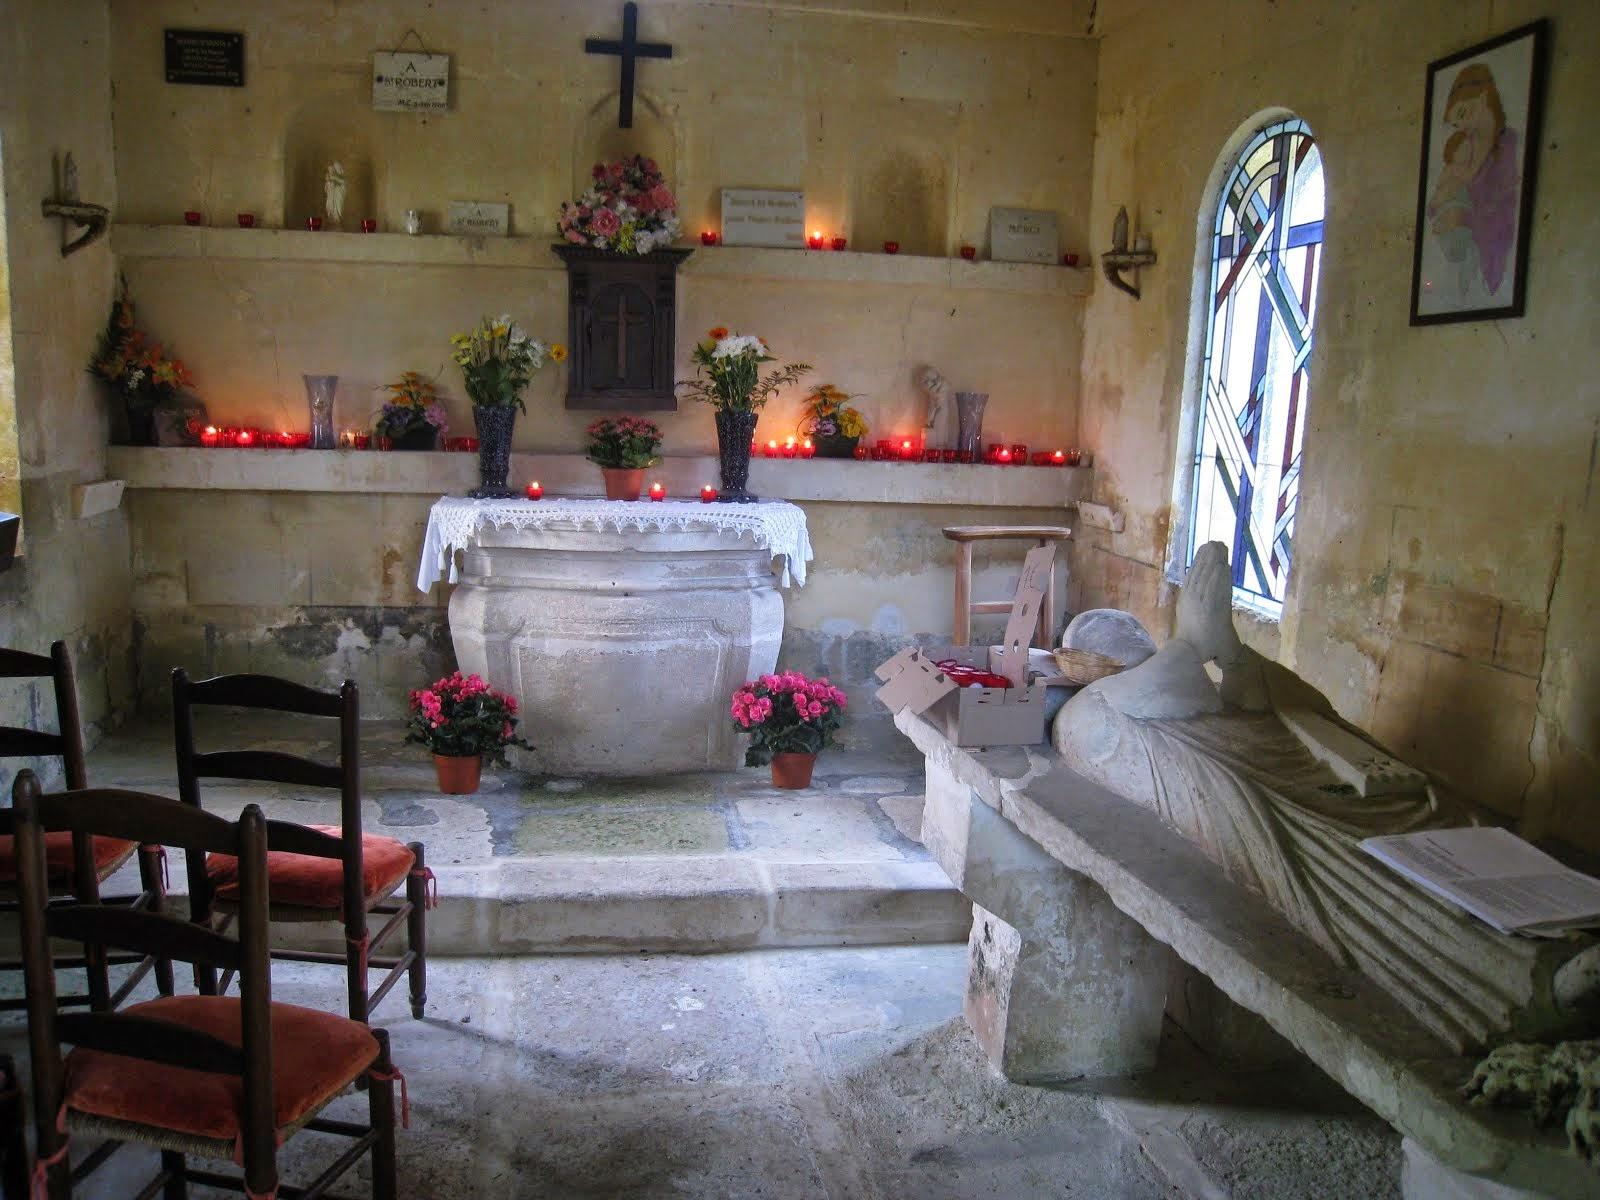 Le gisant de Saint-Robert